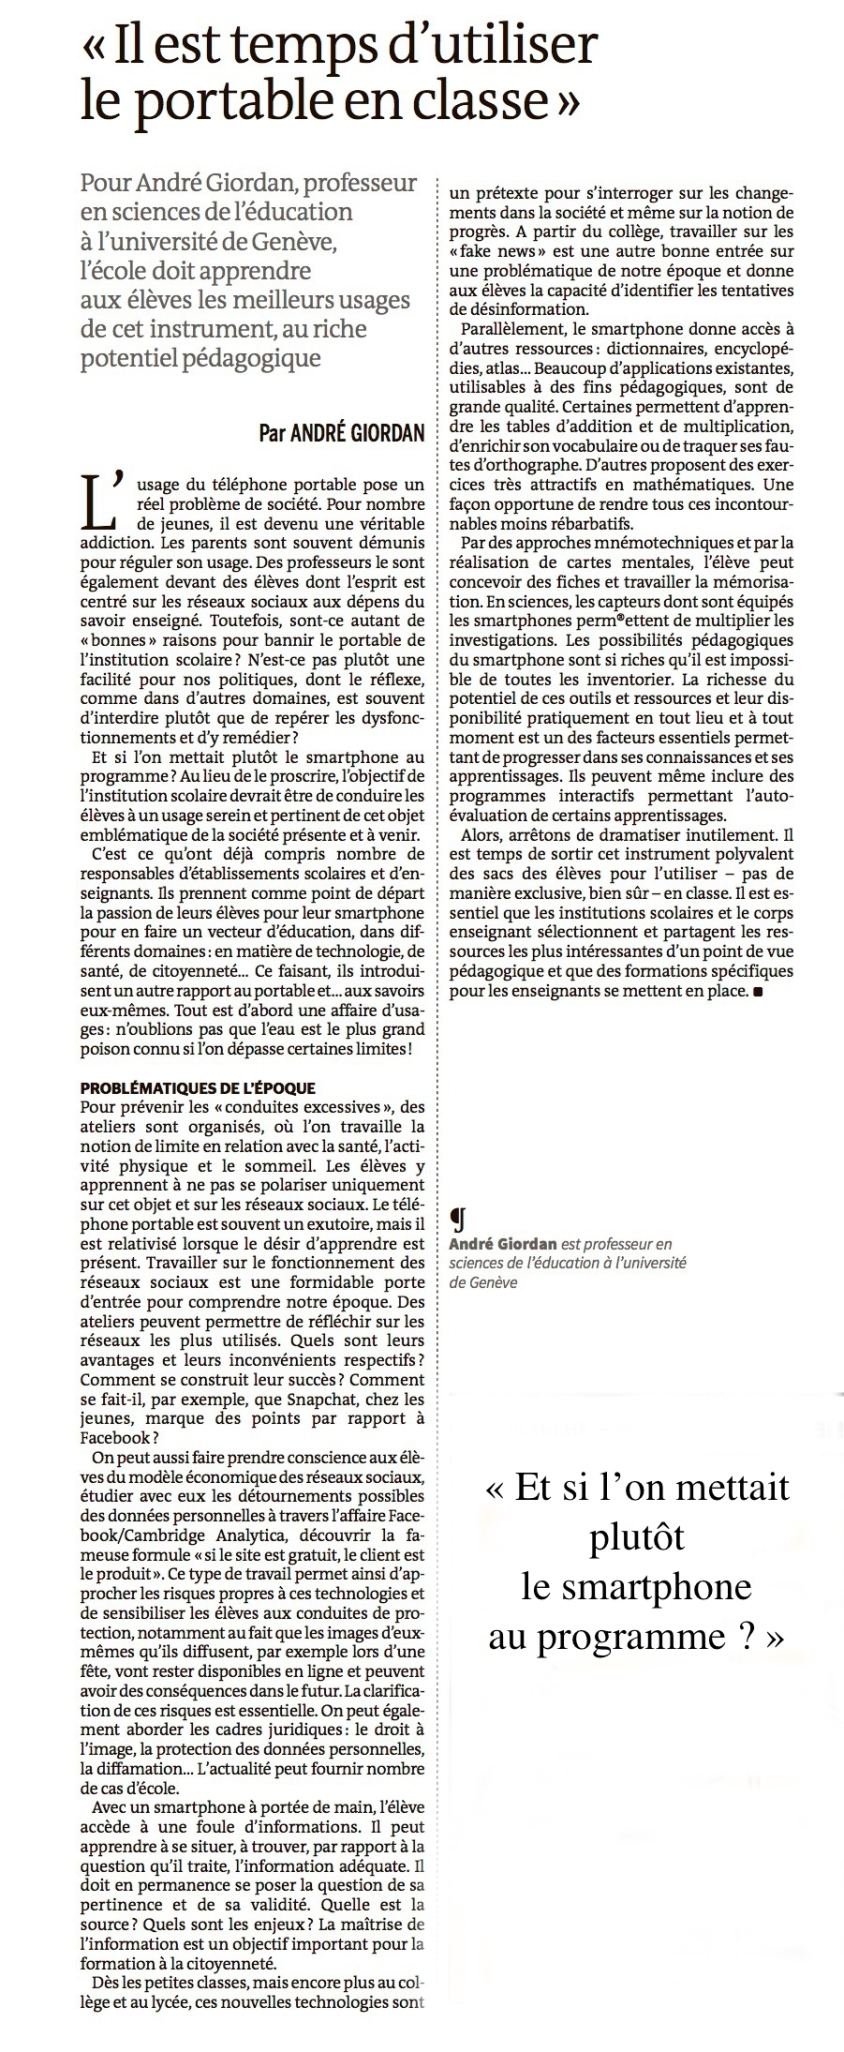 lemonde280818 page 19